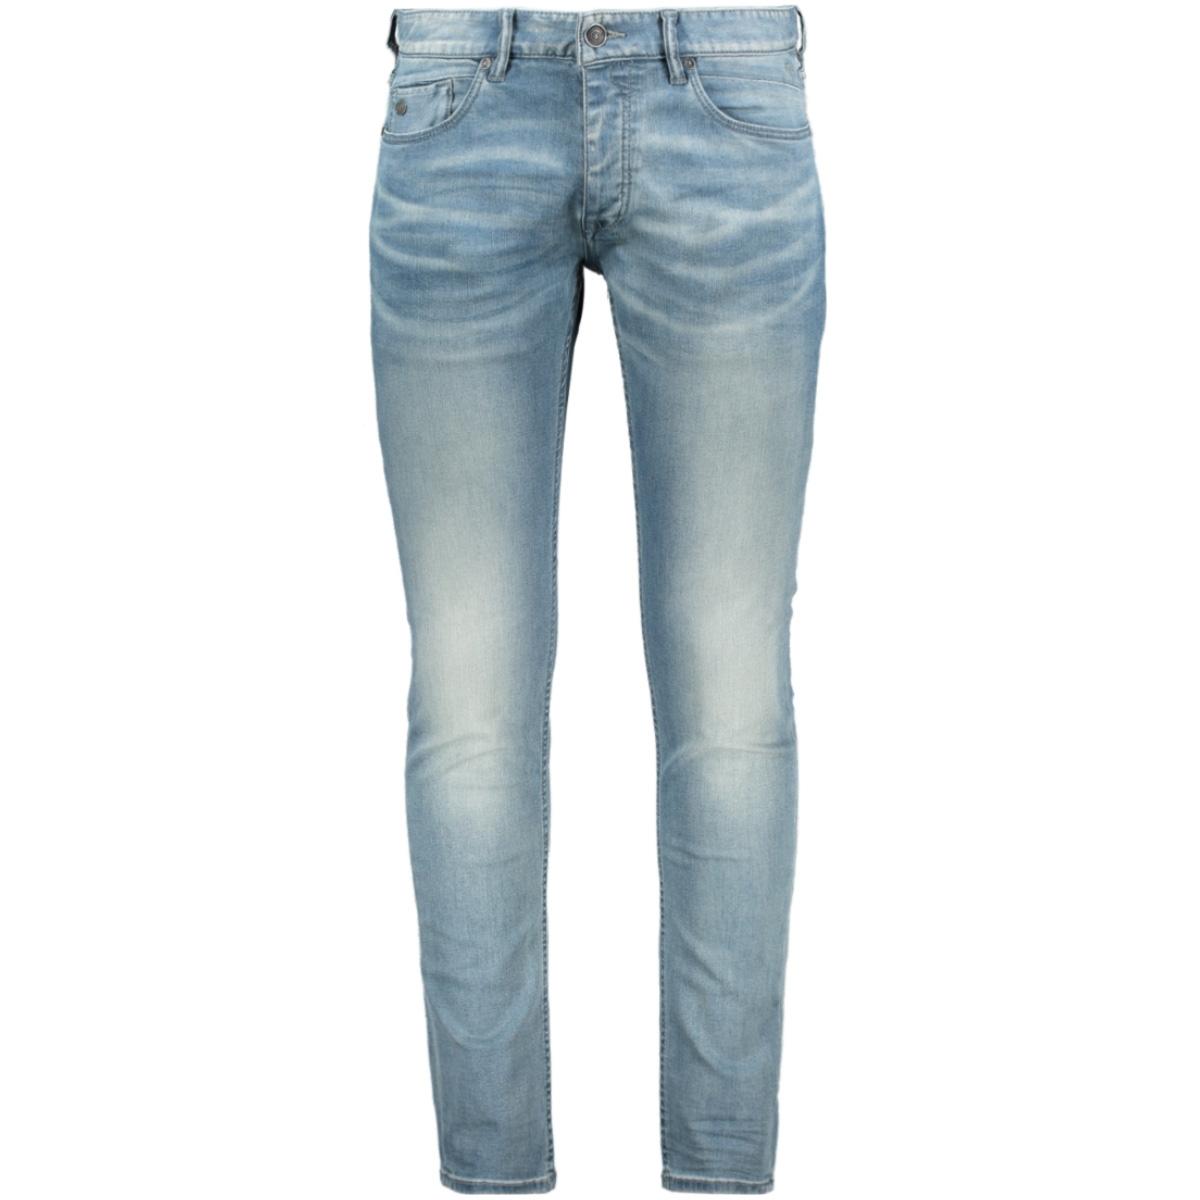 riser summer greencast ctr201222 sug cast iron jeans sug